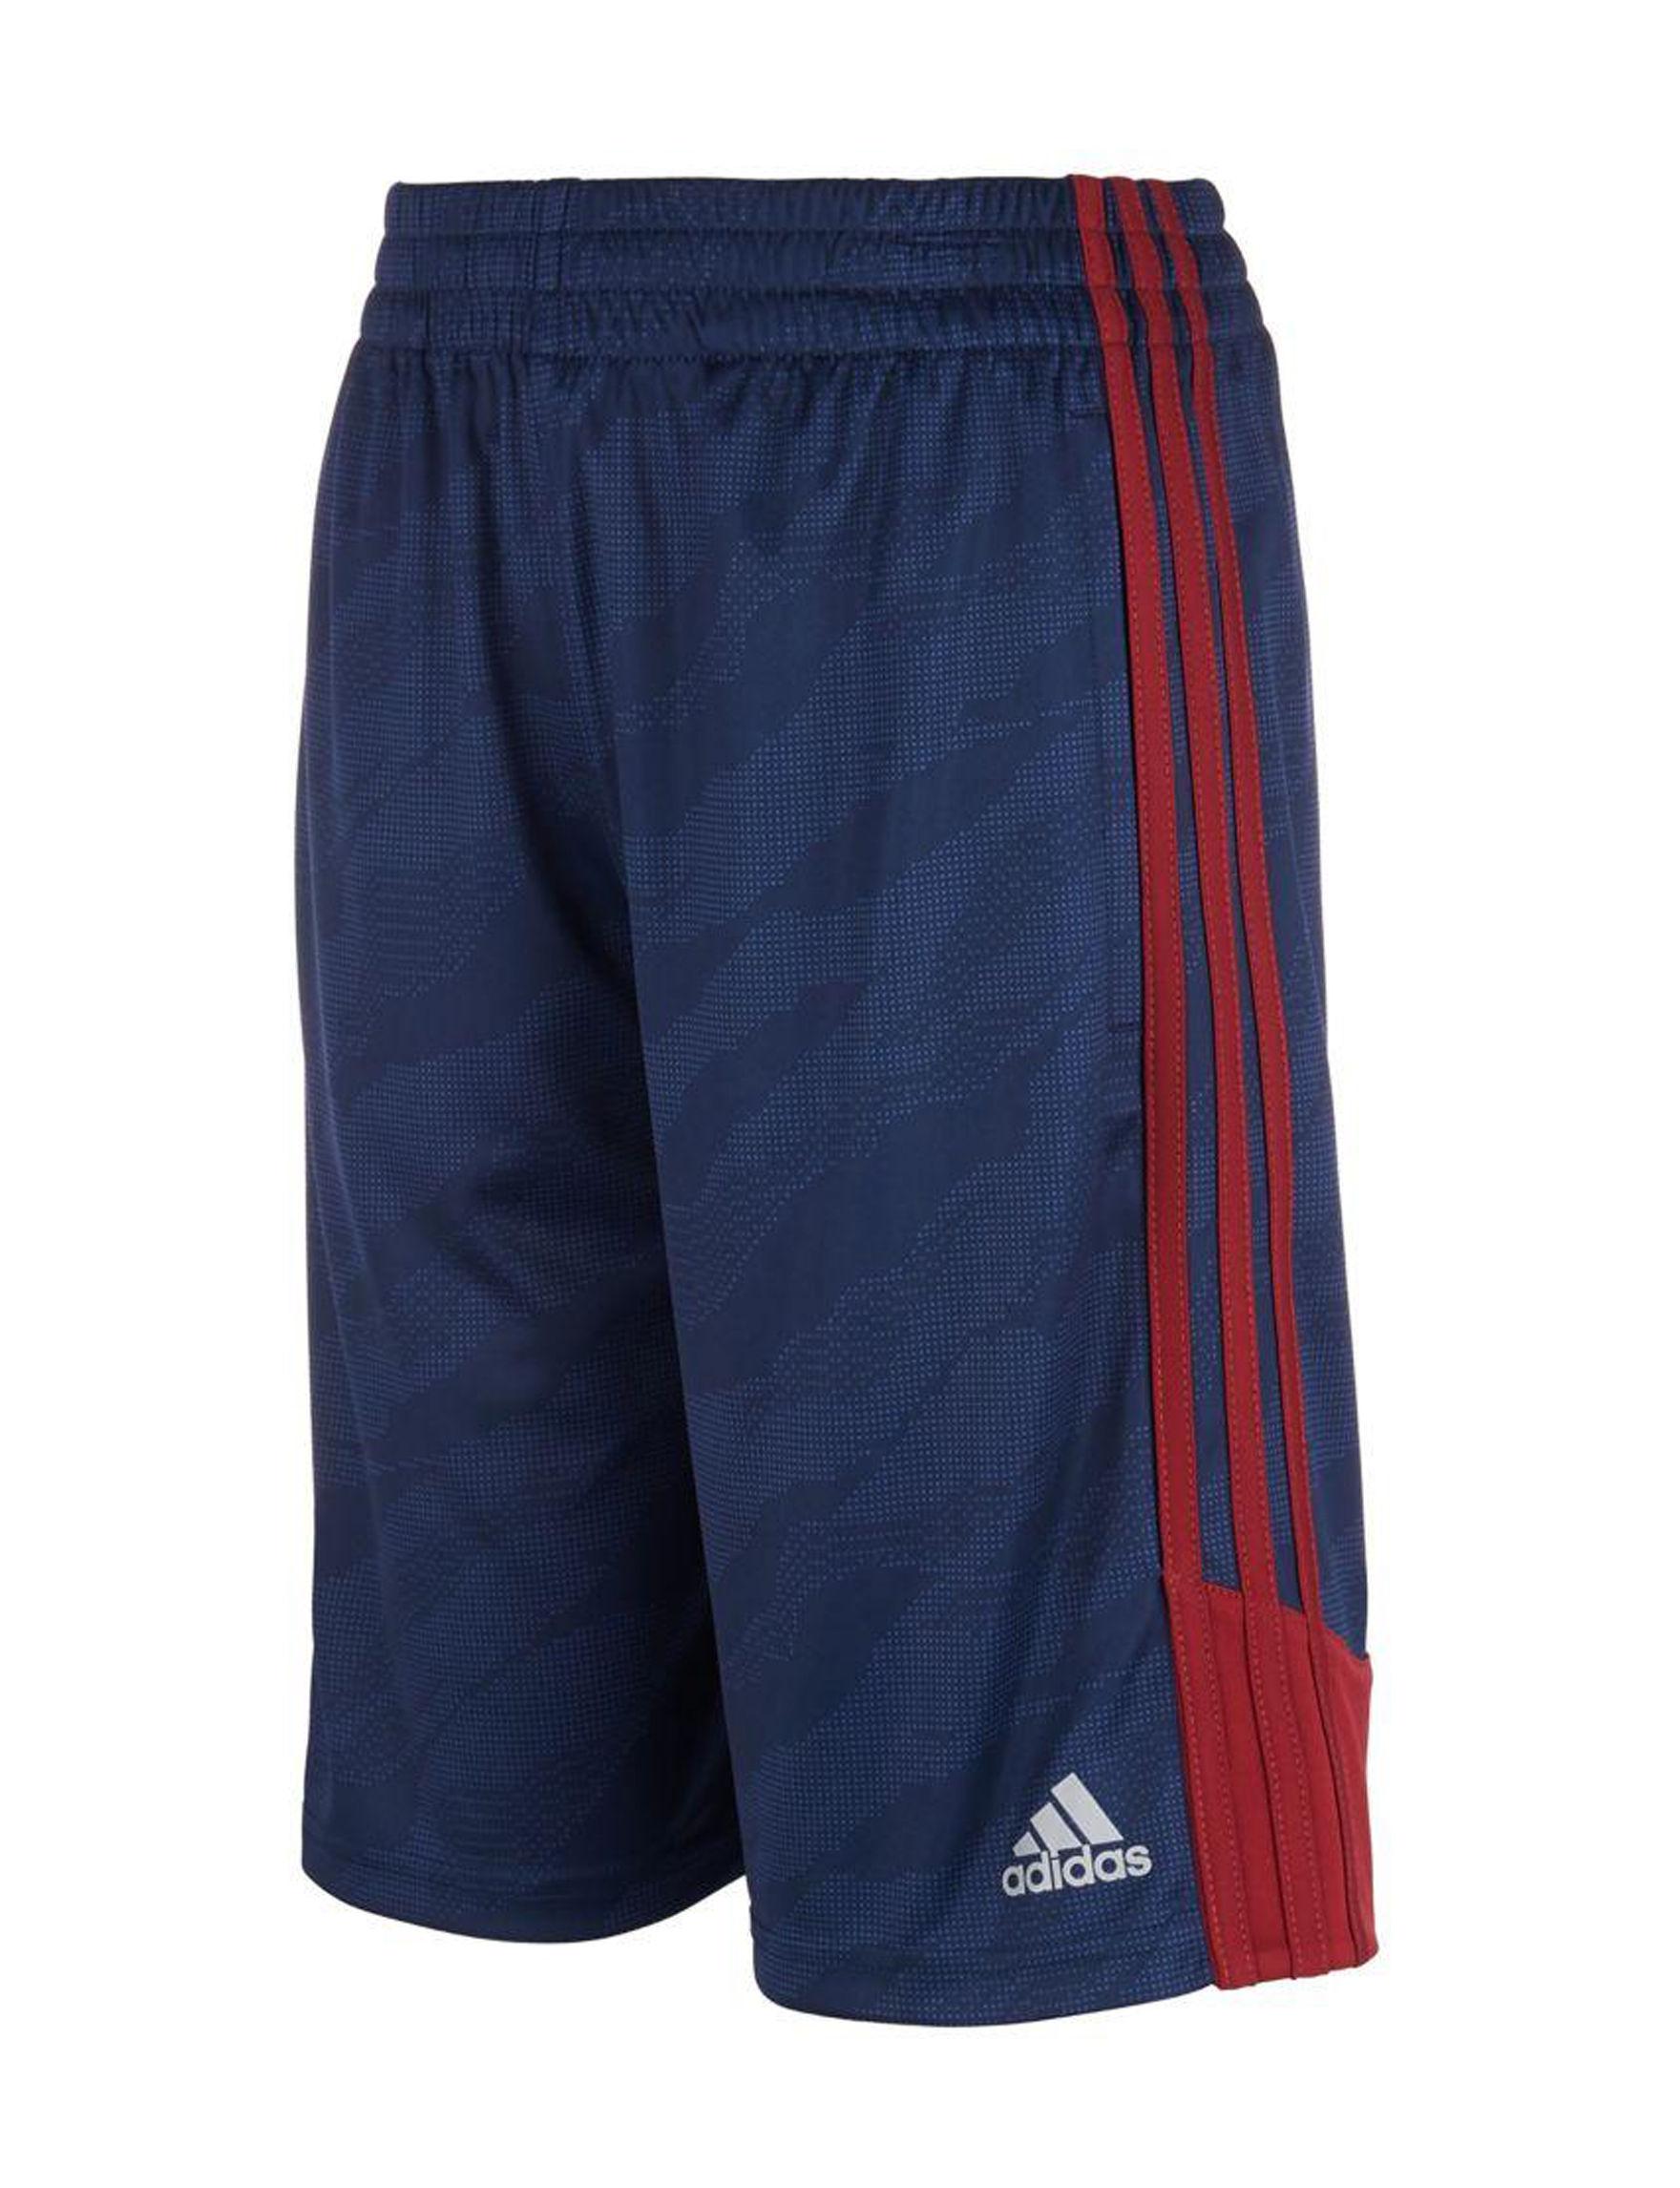 Adidas Blue / Red